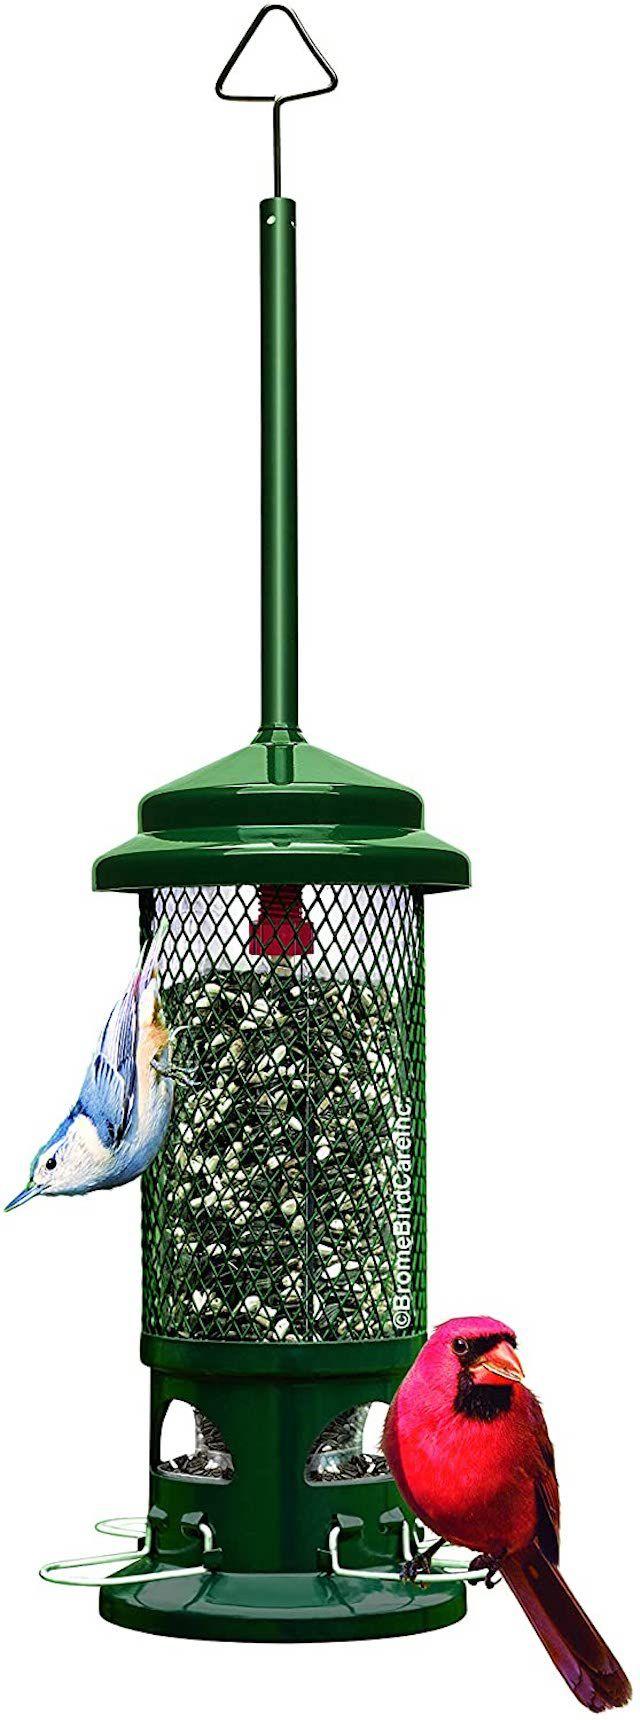 Brome Squirrel Buster Standard Squirrel-proof Bird Feeder w/4 Metal Perches